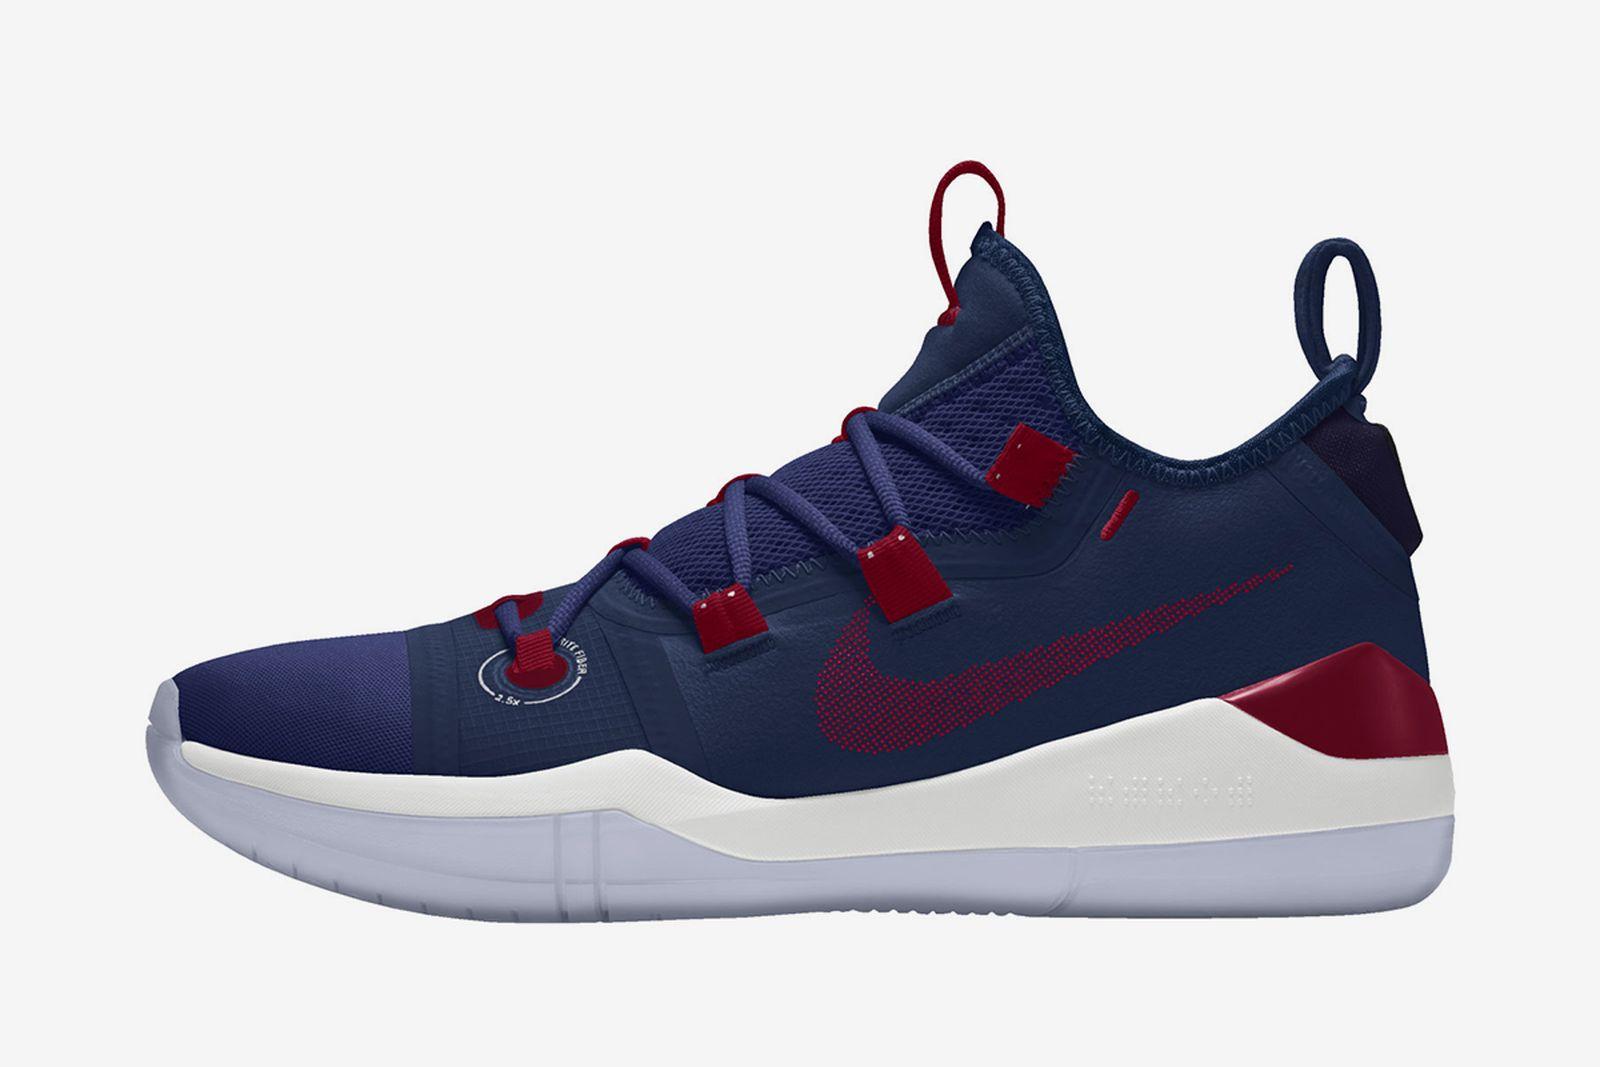 nike nba 2018 2019 player exclusive sneakers